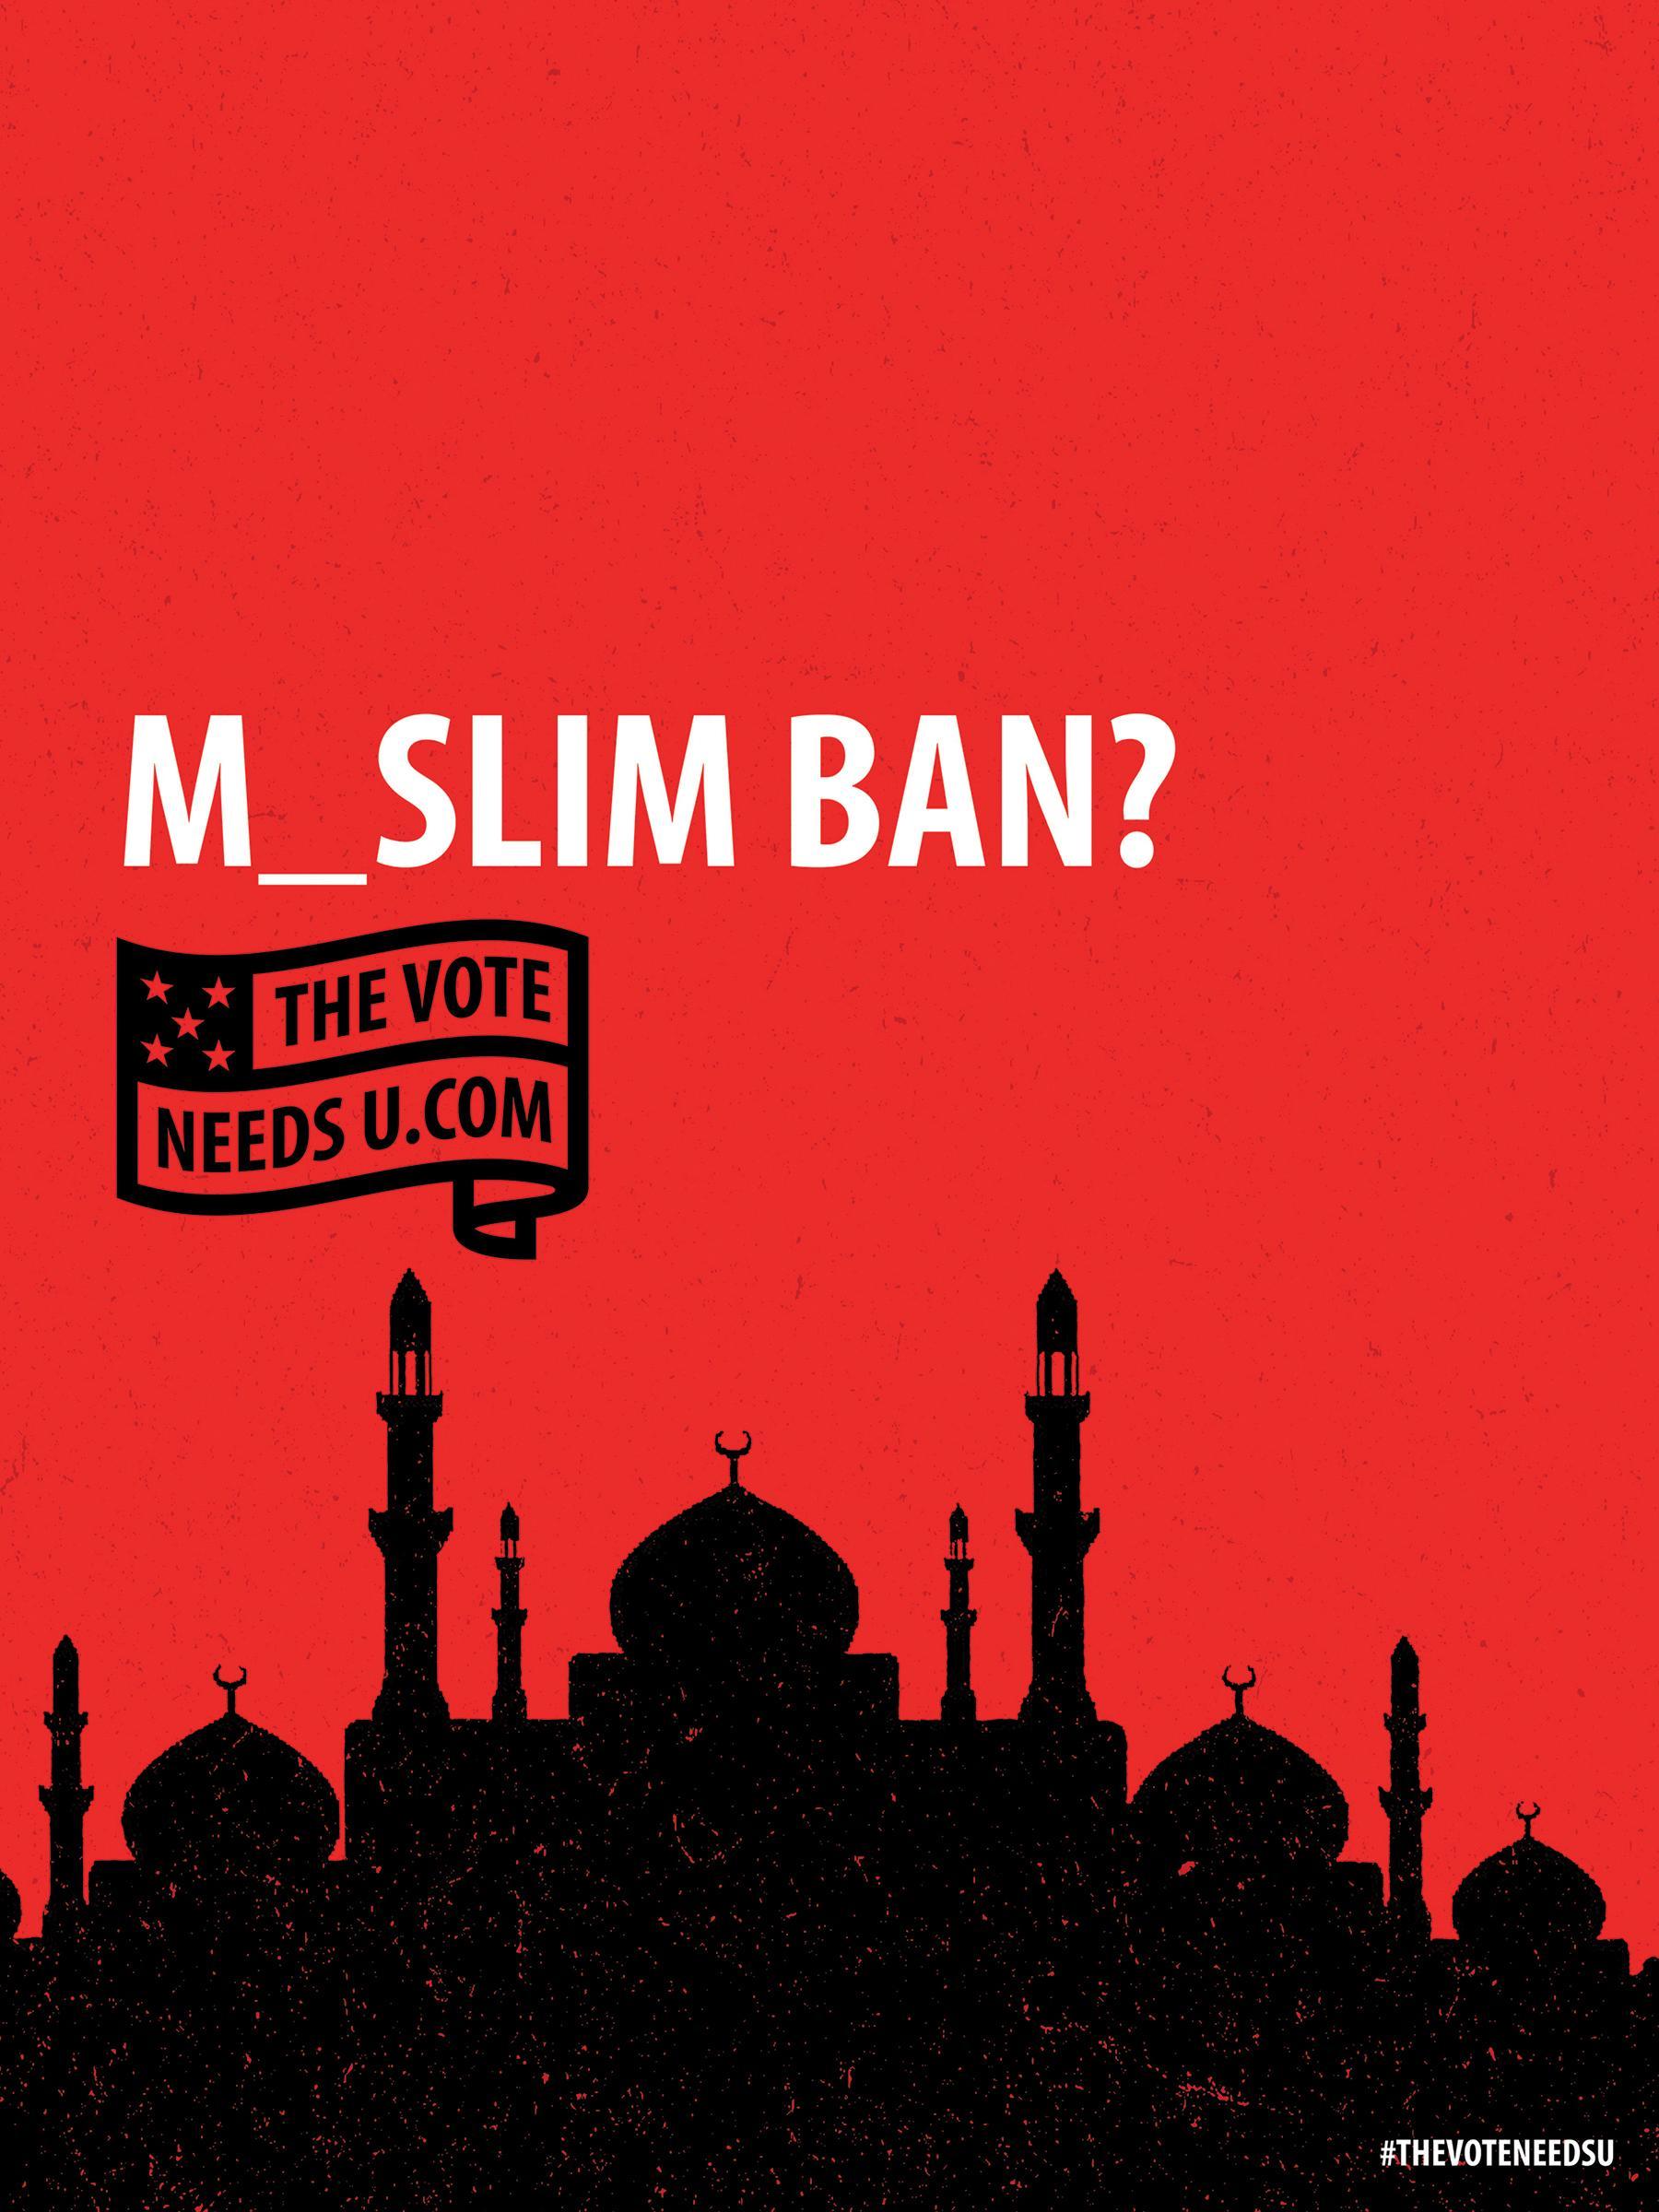 25.Thevoteneedsu Posters Muslimban Aotw 0.[大嘴收纳屋].jpg